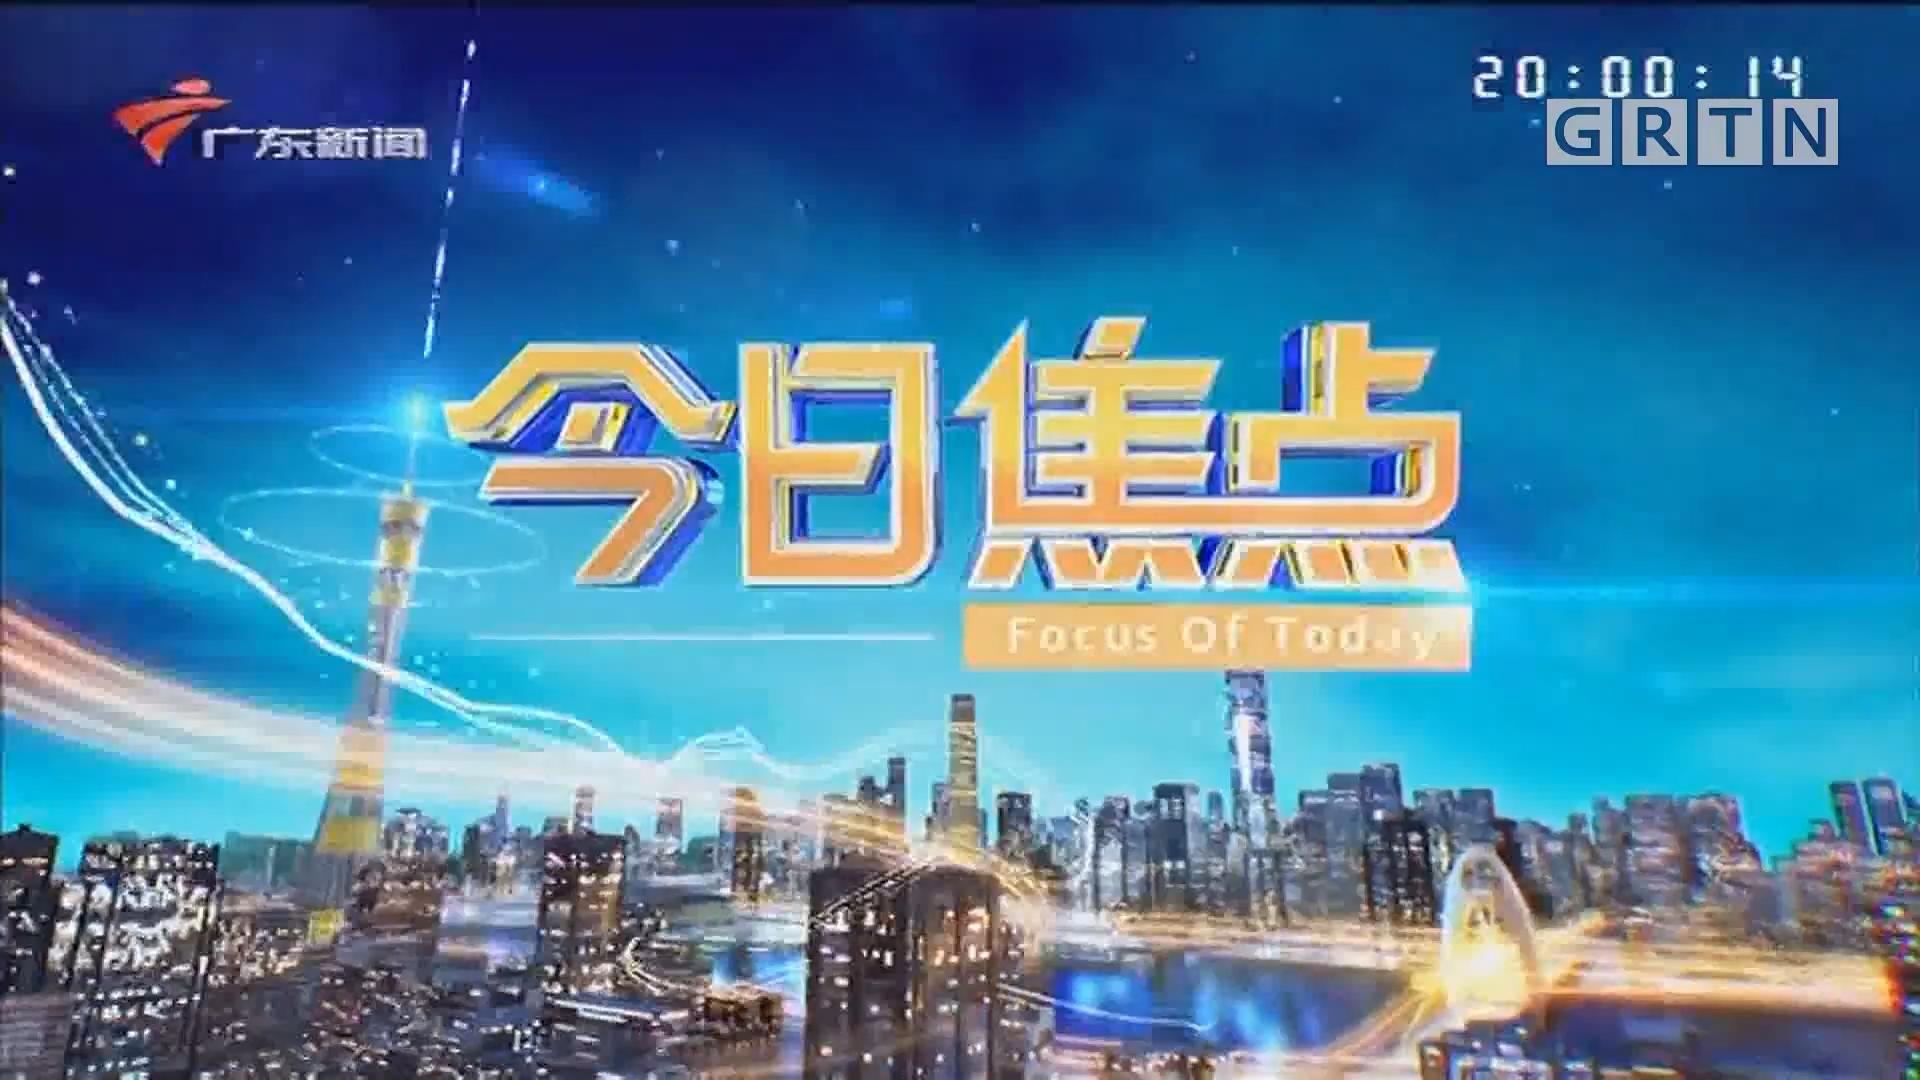 [HD][2020-01-29]今日焦点:武汉汉口医院:记者深入隔离病房 直击医护人员救治病患